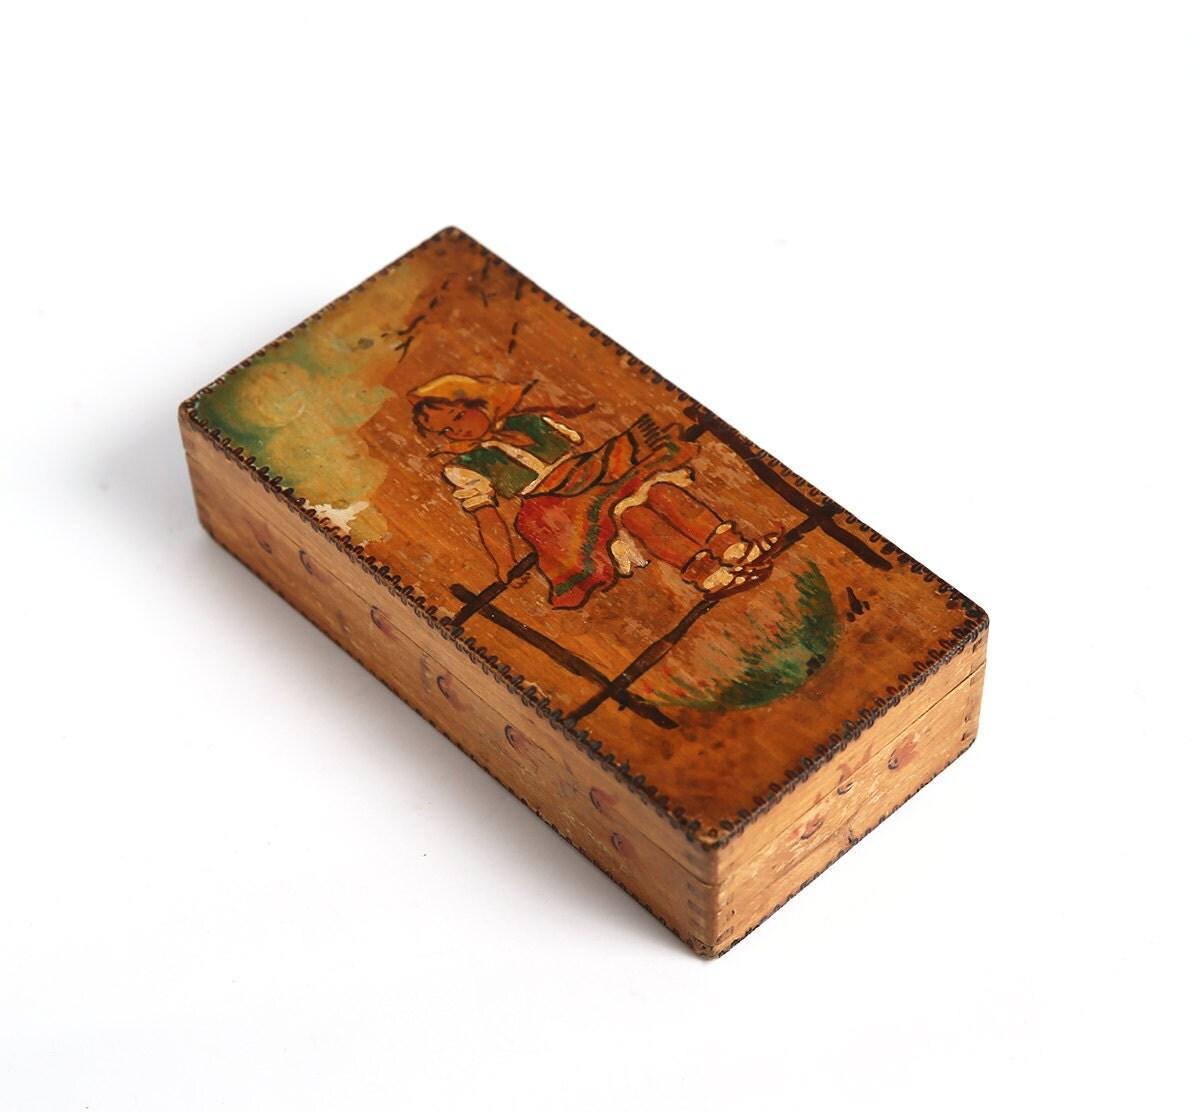 Vintage handmade wooden box case vintage jewelry by for Handmade wooden jewelry box